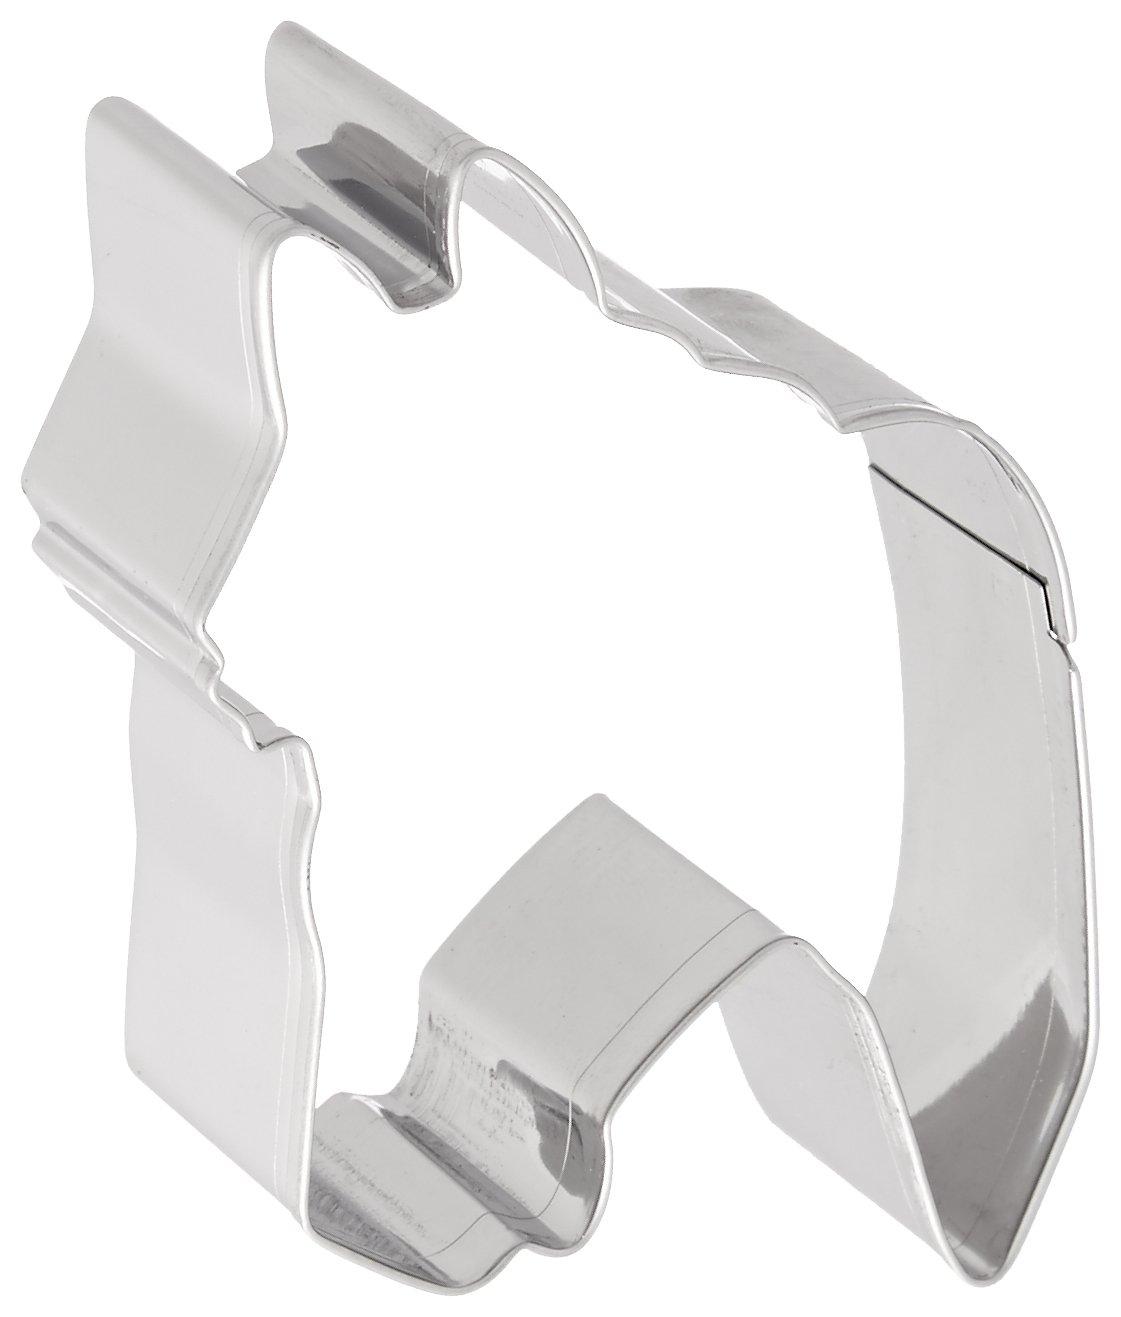 Fox Run 2428 Horse Head Cookie Cutter, 3-Inch, Stainless Steel